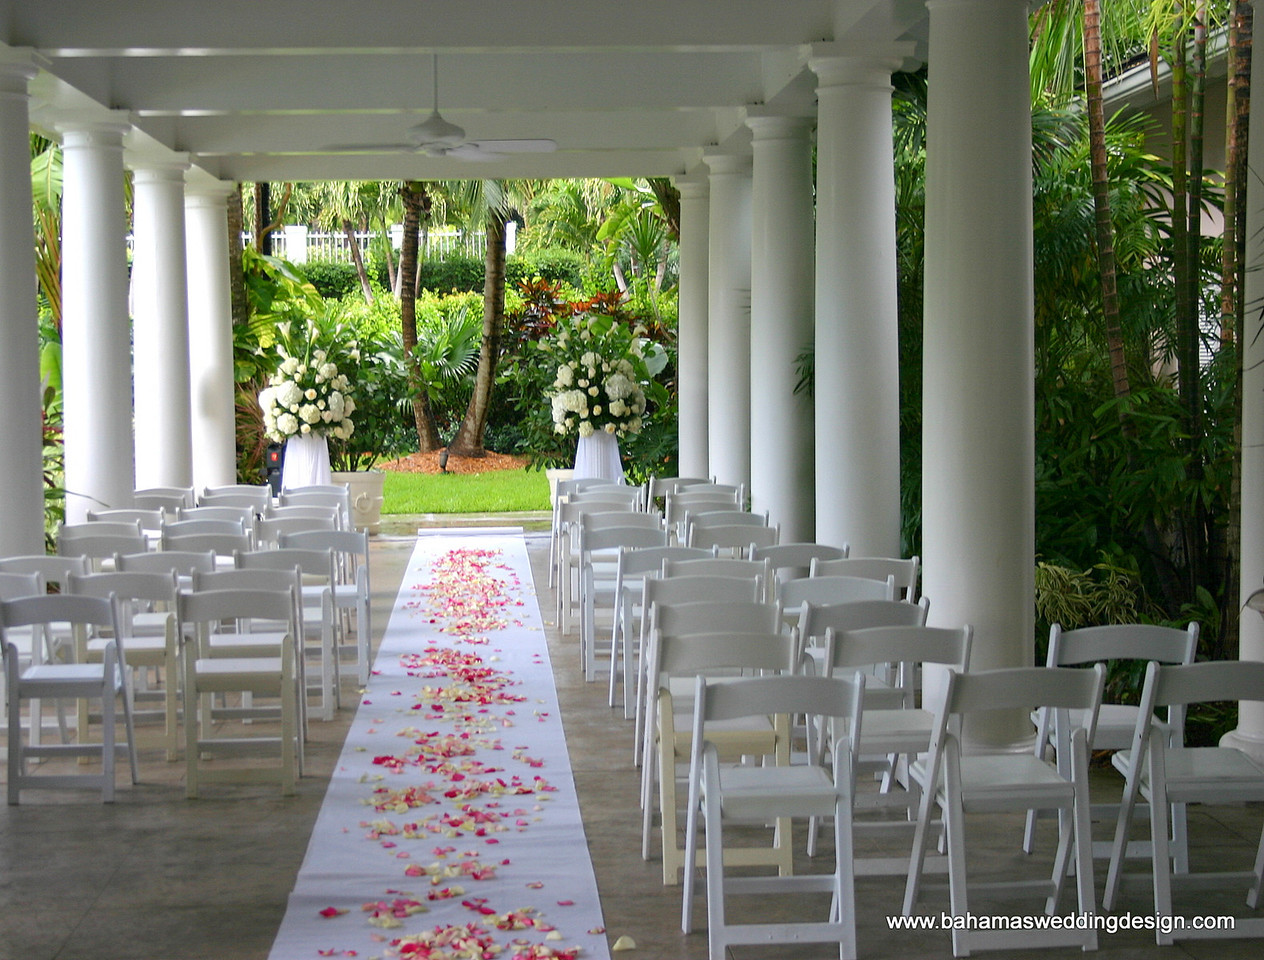 Altar Arrangements - White Hydrangea, calla lilies, white roses